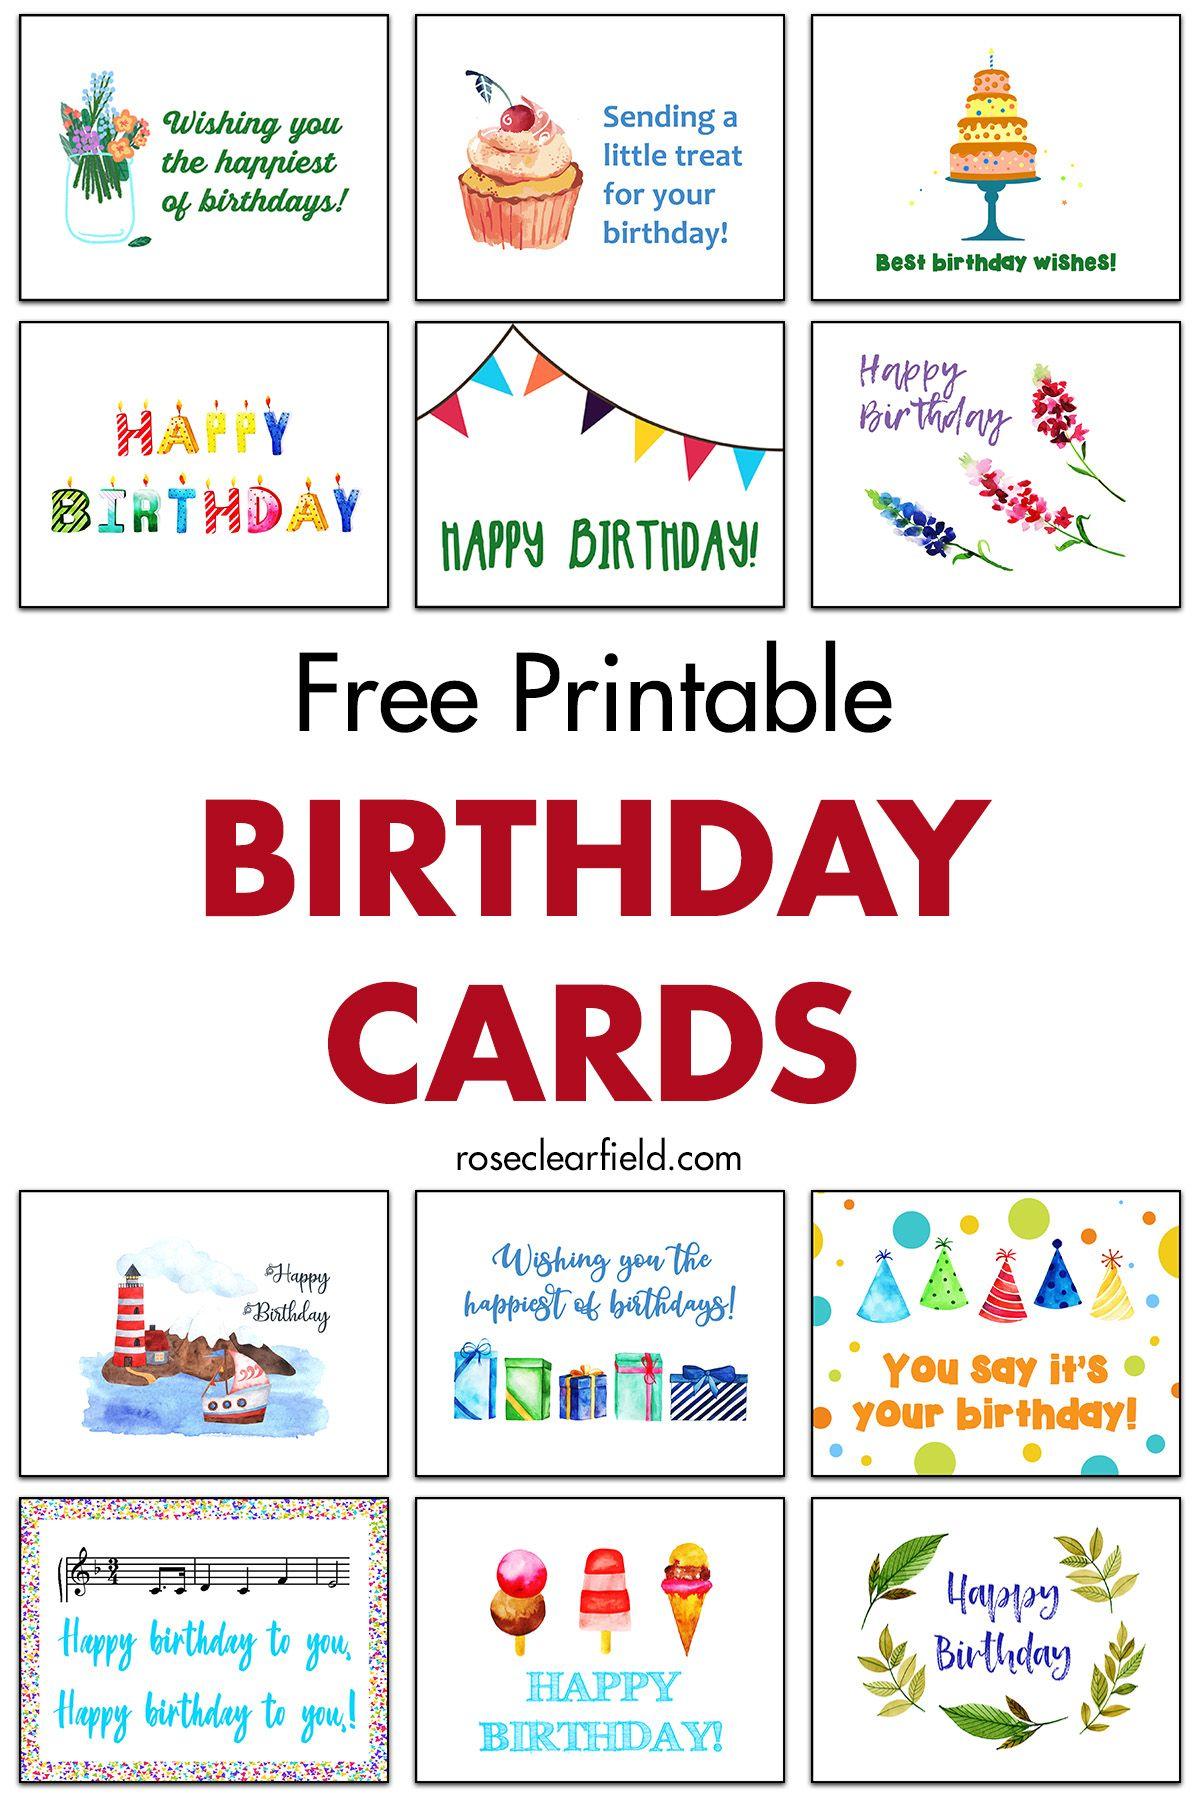 Free Printable Birthday Cards Free Printable Birthday Cards Happy Birthday Cards Printable Birthday Cards To Print